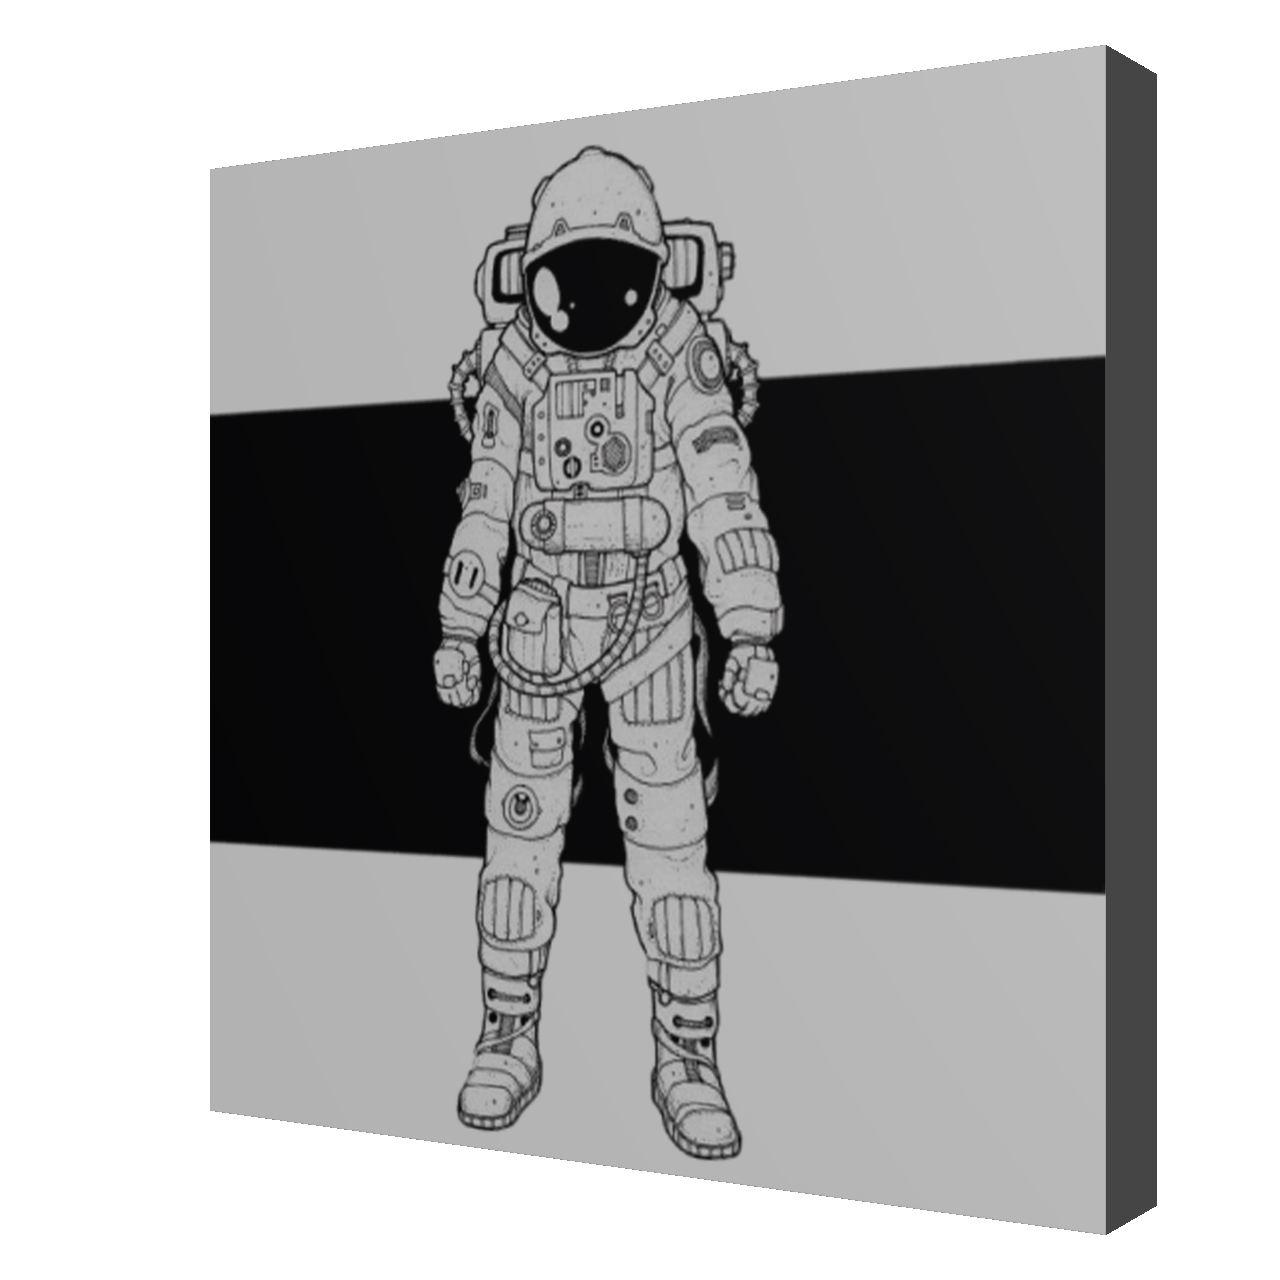 پیکسل طرح فضانورد کد 11 -  - 2